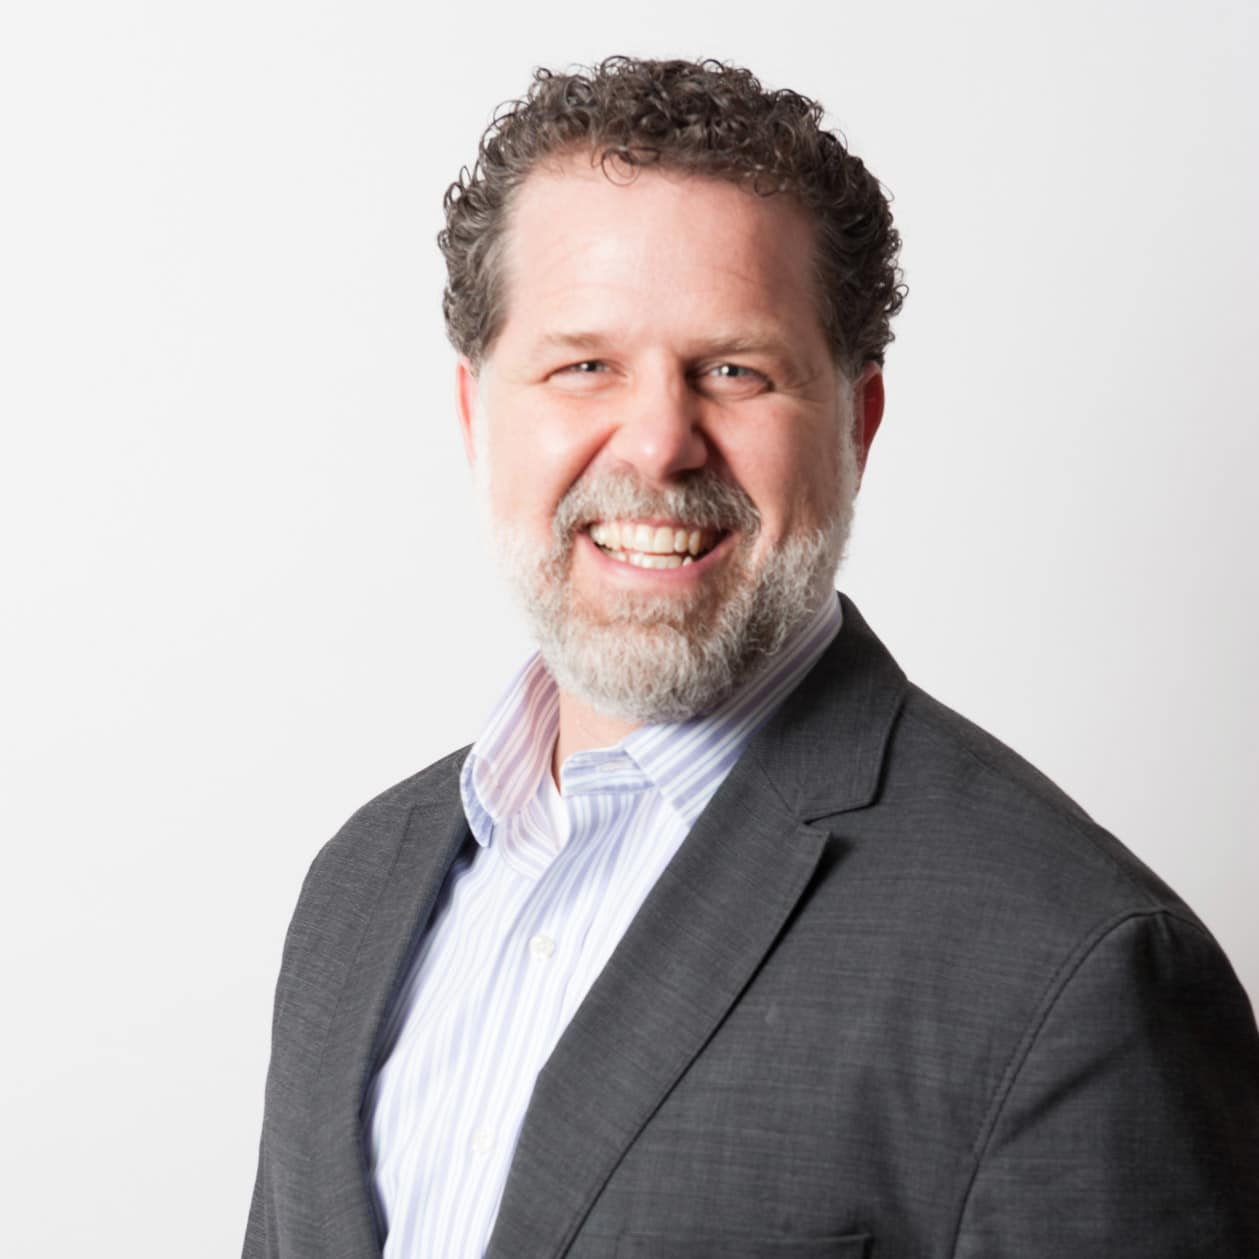 David H. Haase, MD